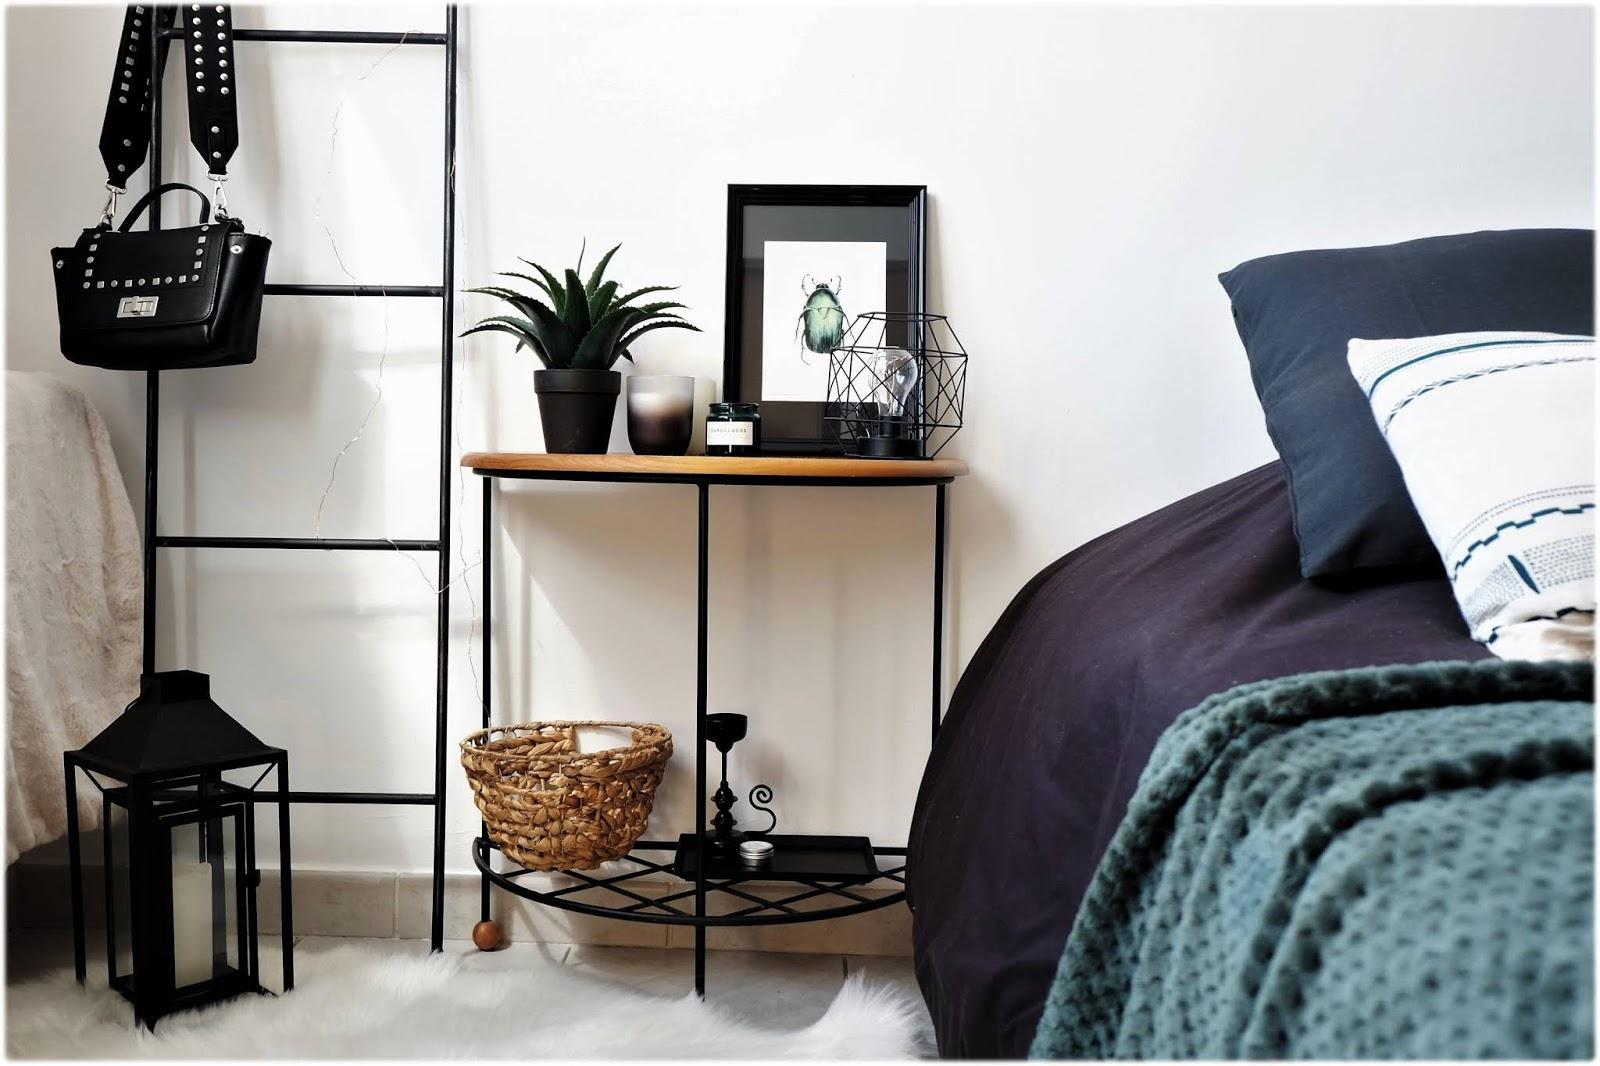 Petite déco, petits prix : Action, H&M Home, Primark, Muy Mucho